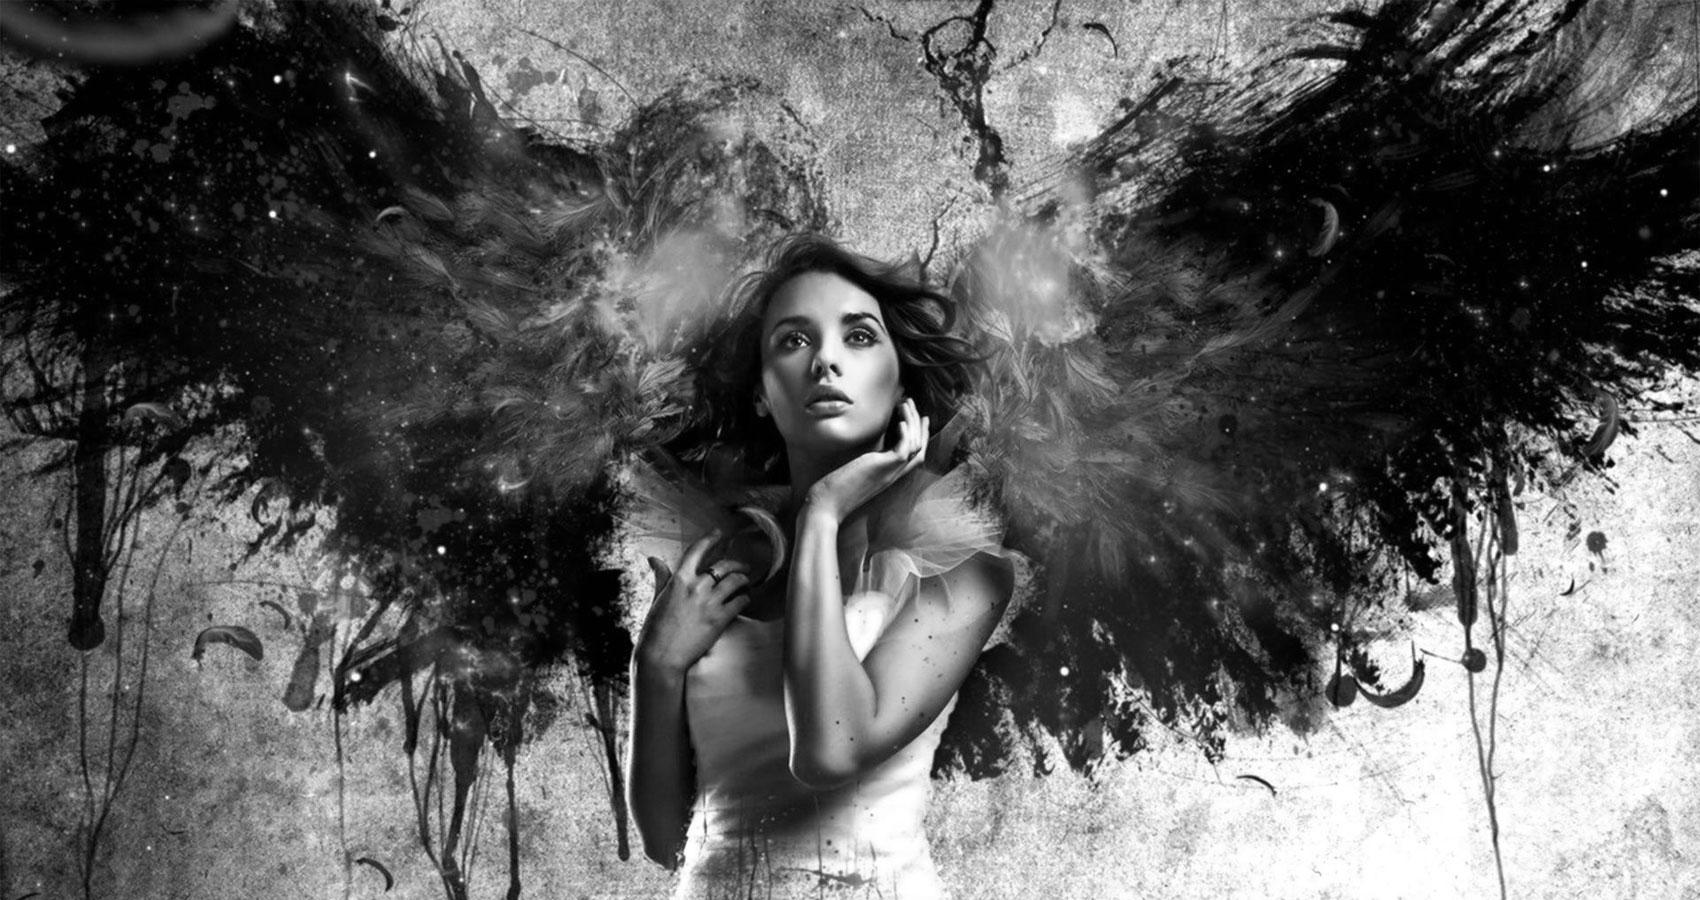 Angel Mist written by JOHN BAVERSTOCK at Spillwords.com